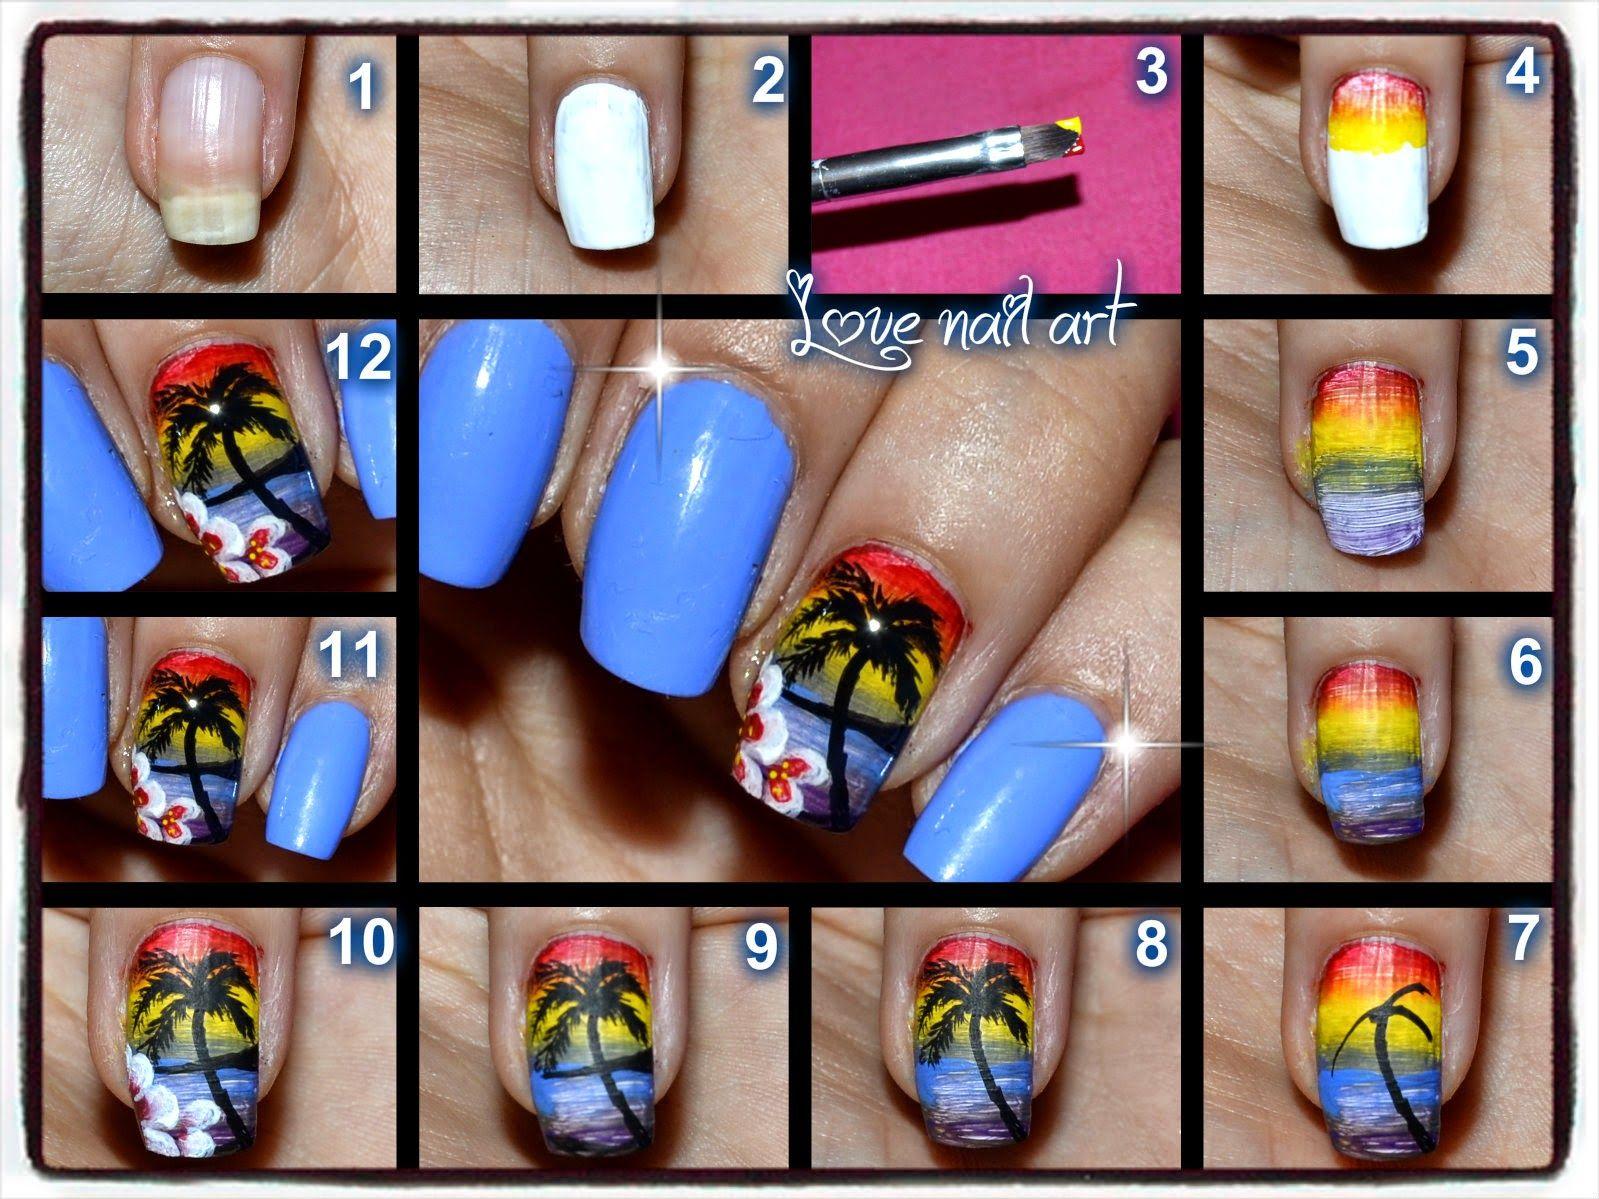 Love nail art tutorial nail art tramonto estivo idee che love nail art tutorial nail art tramonto estivo prinsesfo Gallery